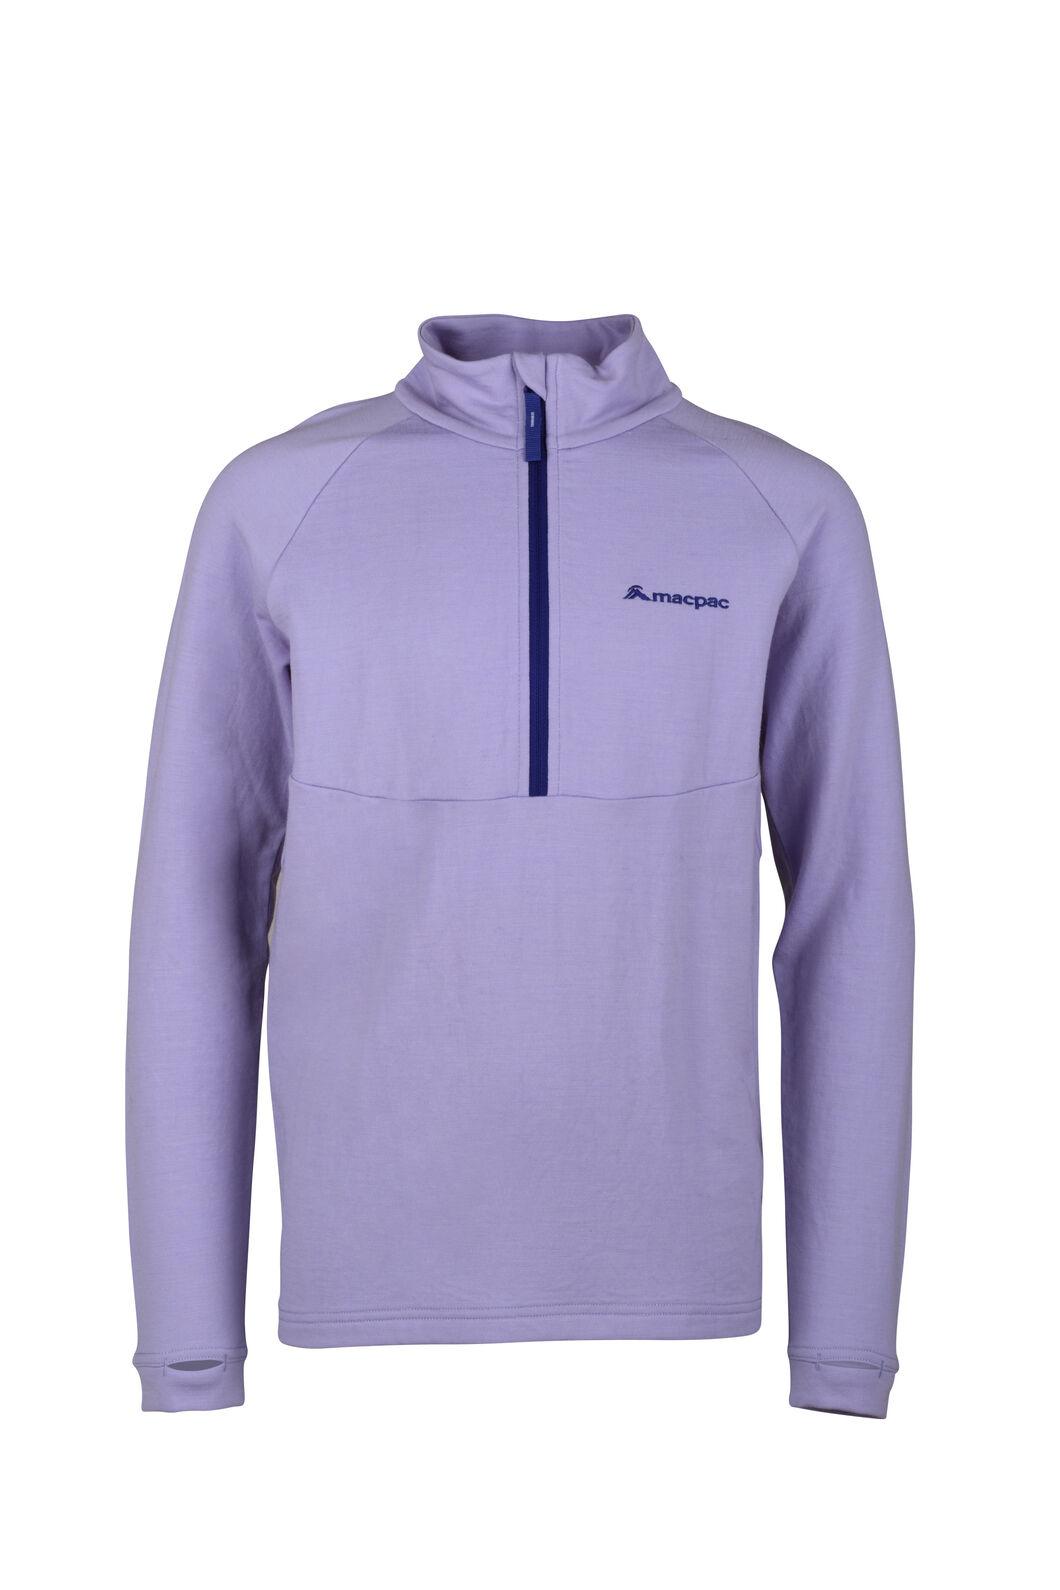 Macpac Merino 280 Pullover - Kids', Sweet Lavender, hi-res